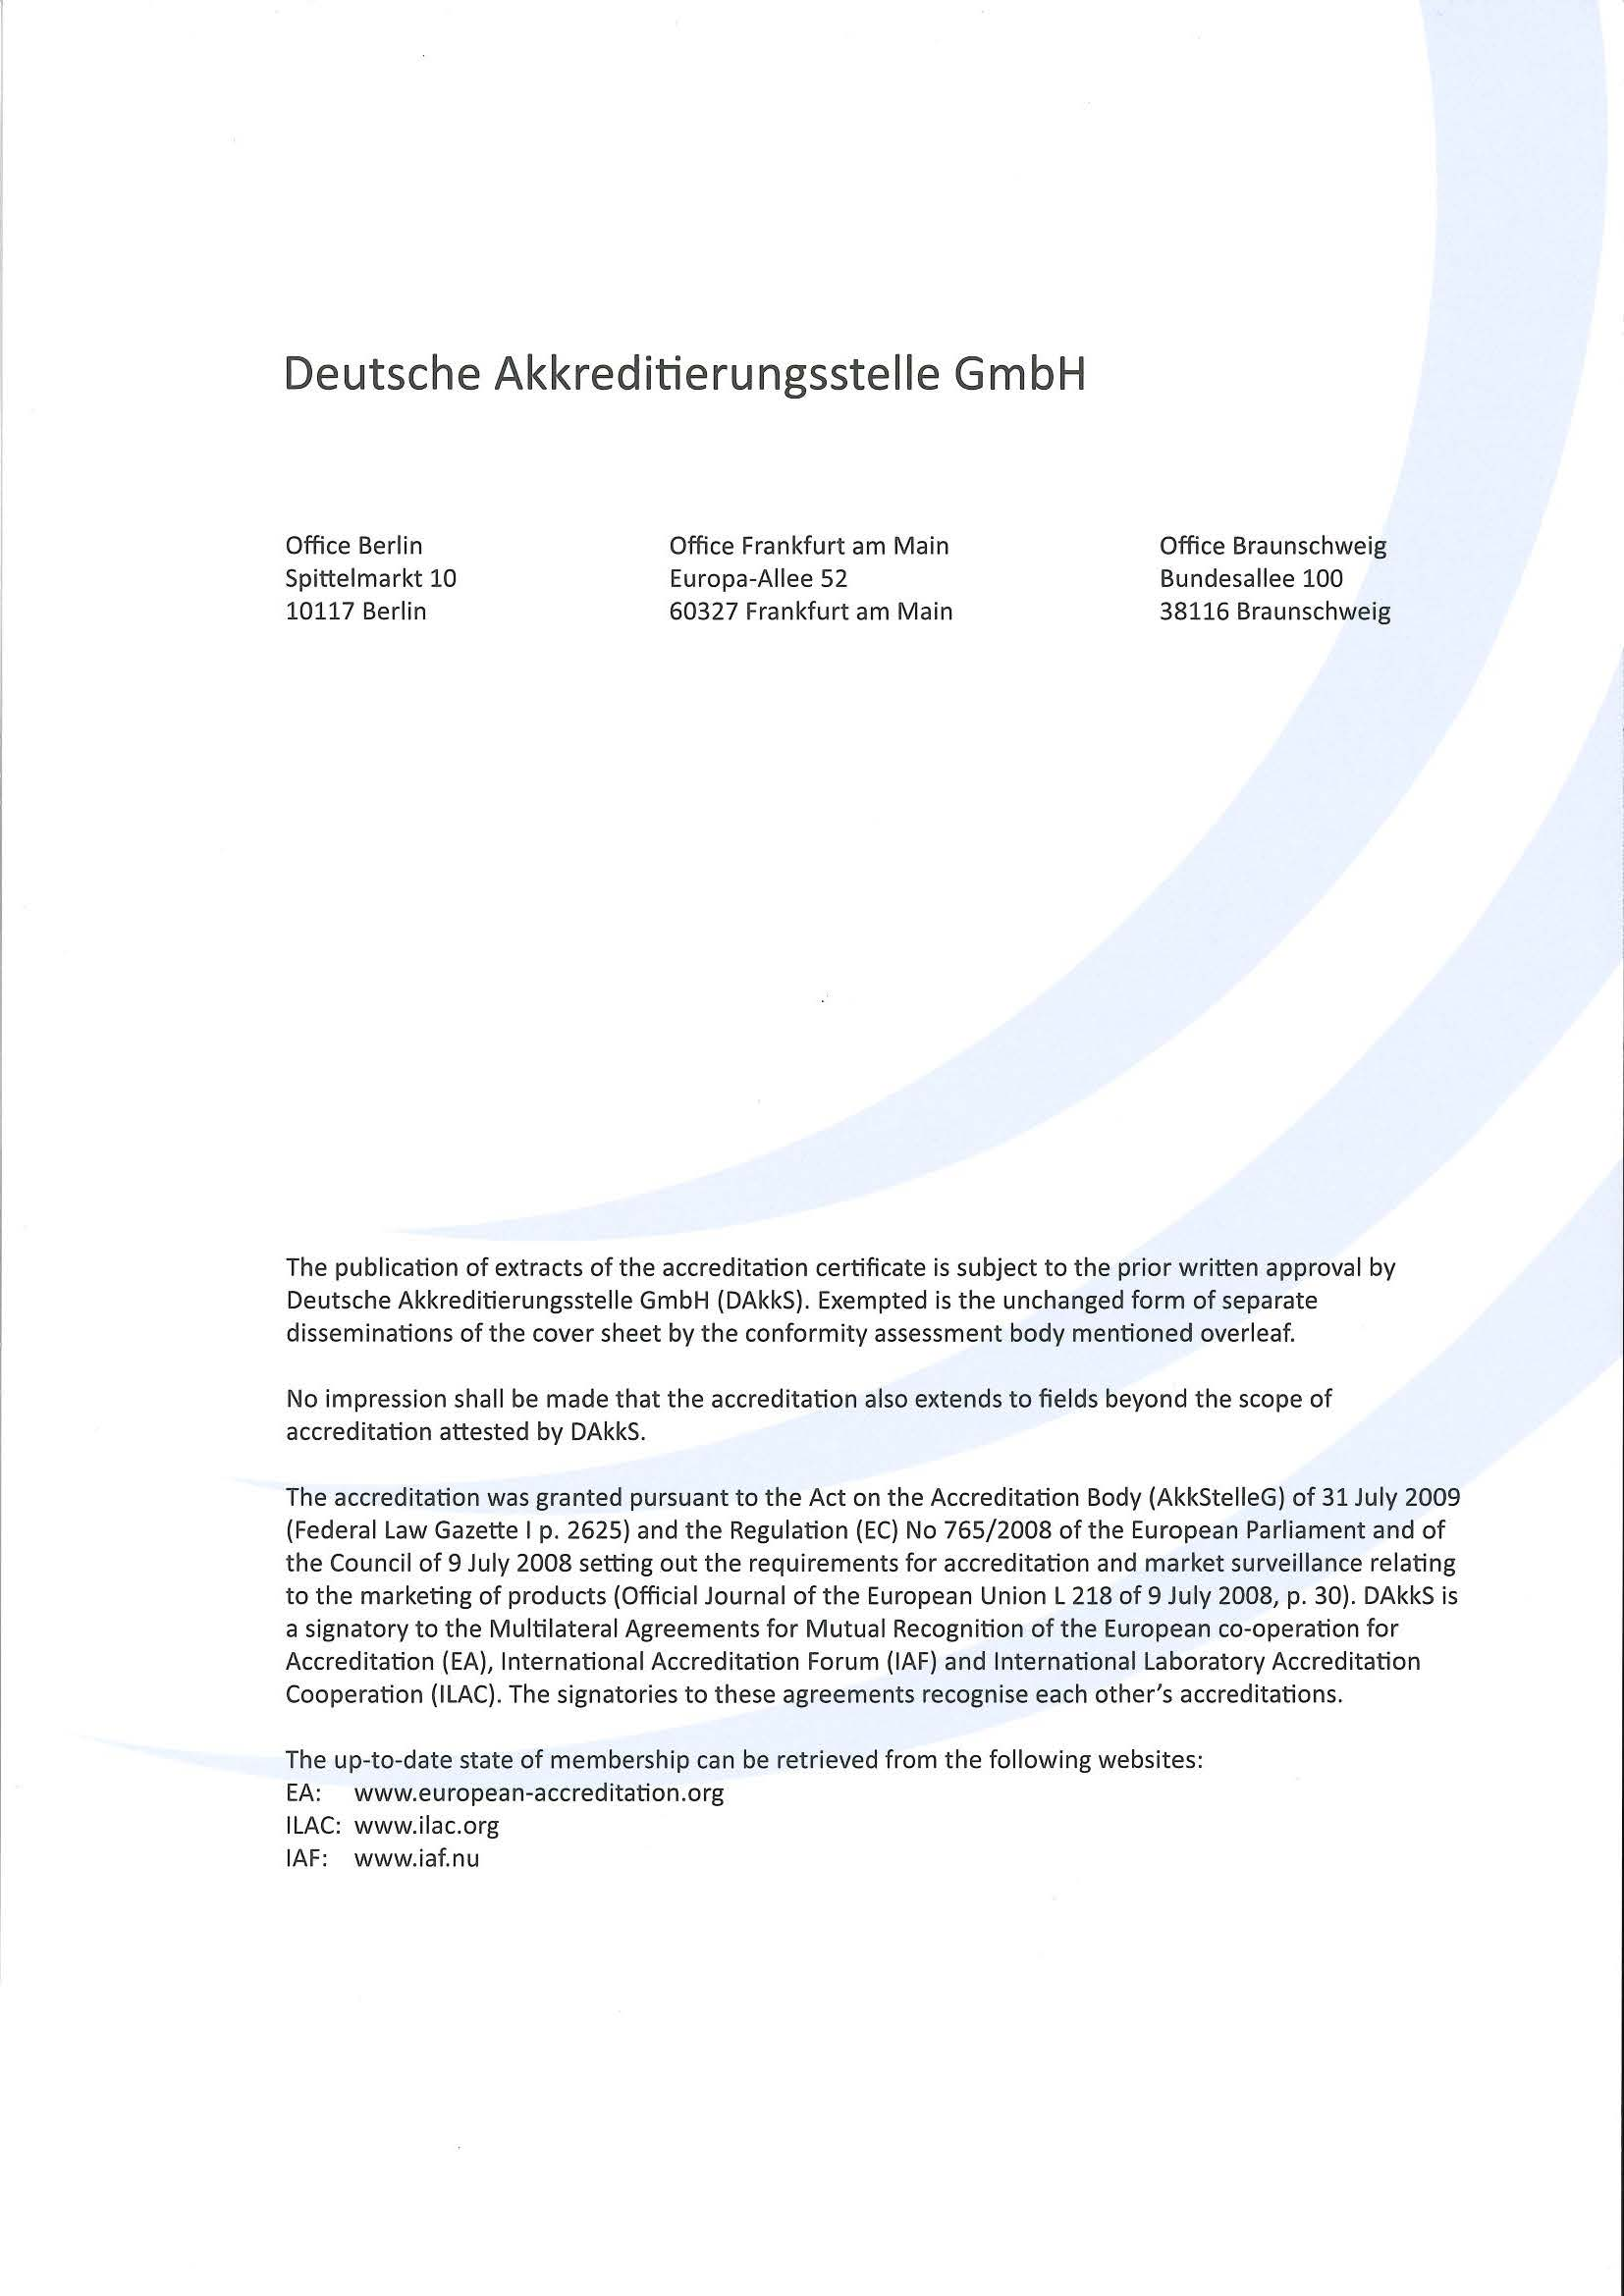 Accreditaton certificate_D-K-17723-01-00_27.11.2019_Stránka_2